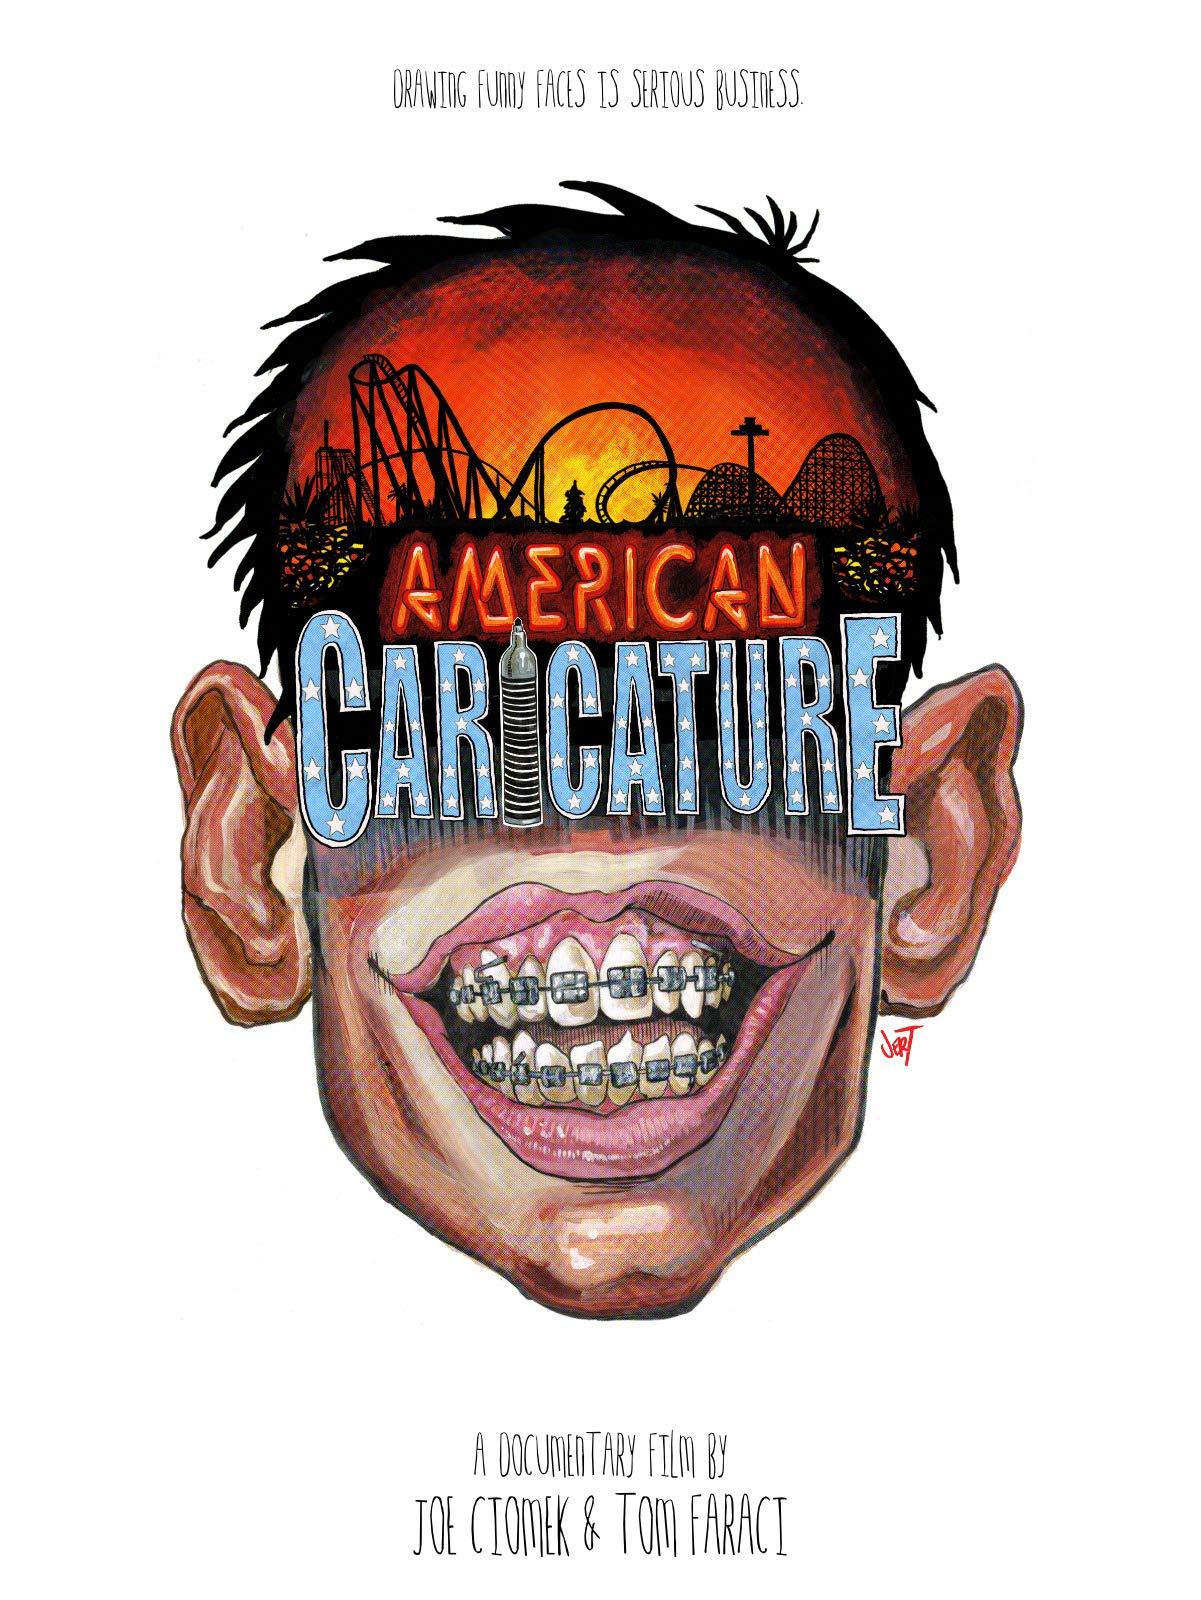 American Caricature